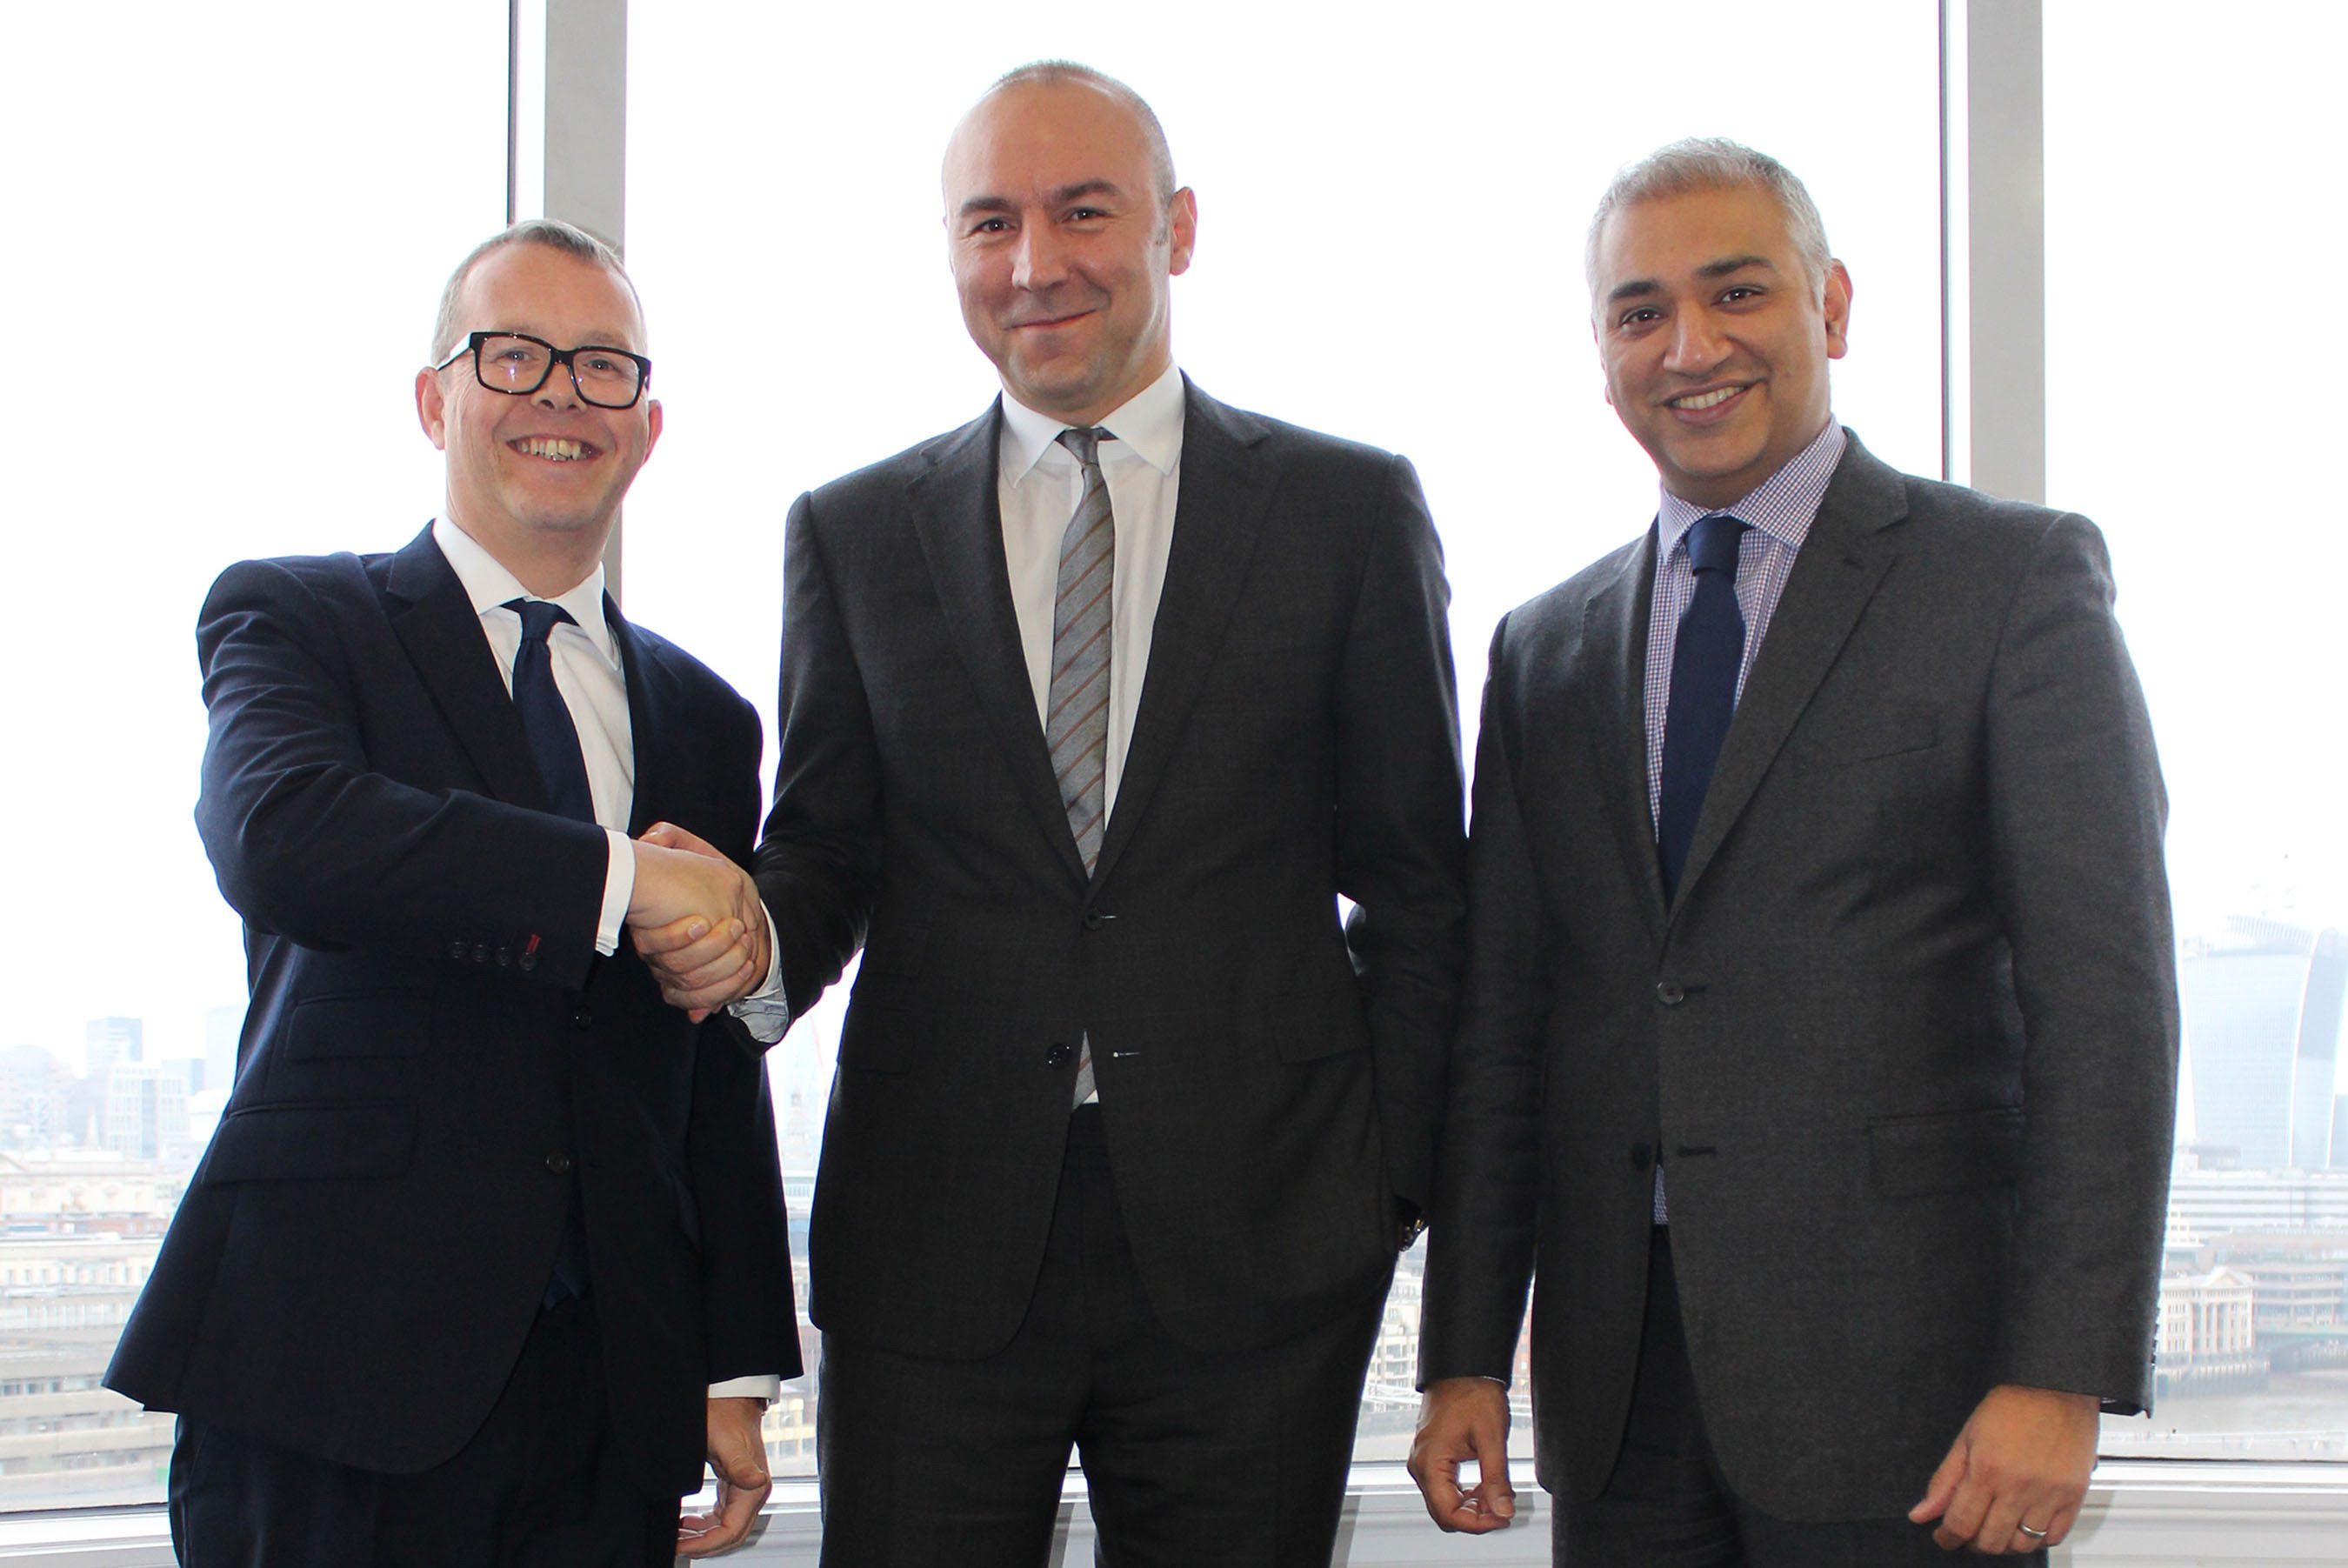 UBM Live strengthens business in Turkey with NTSR partnership. (PRNewsFoto/UBM Live) (PRNewsFoto/UBM LIVE)